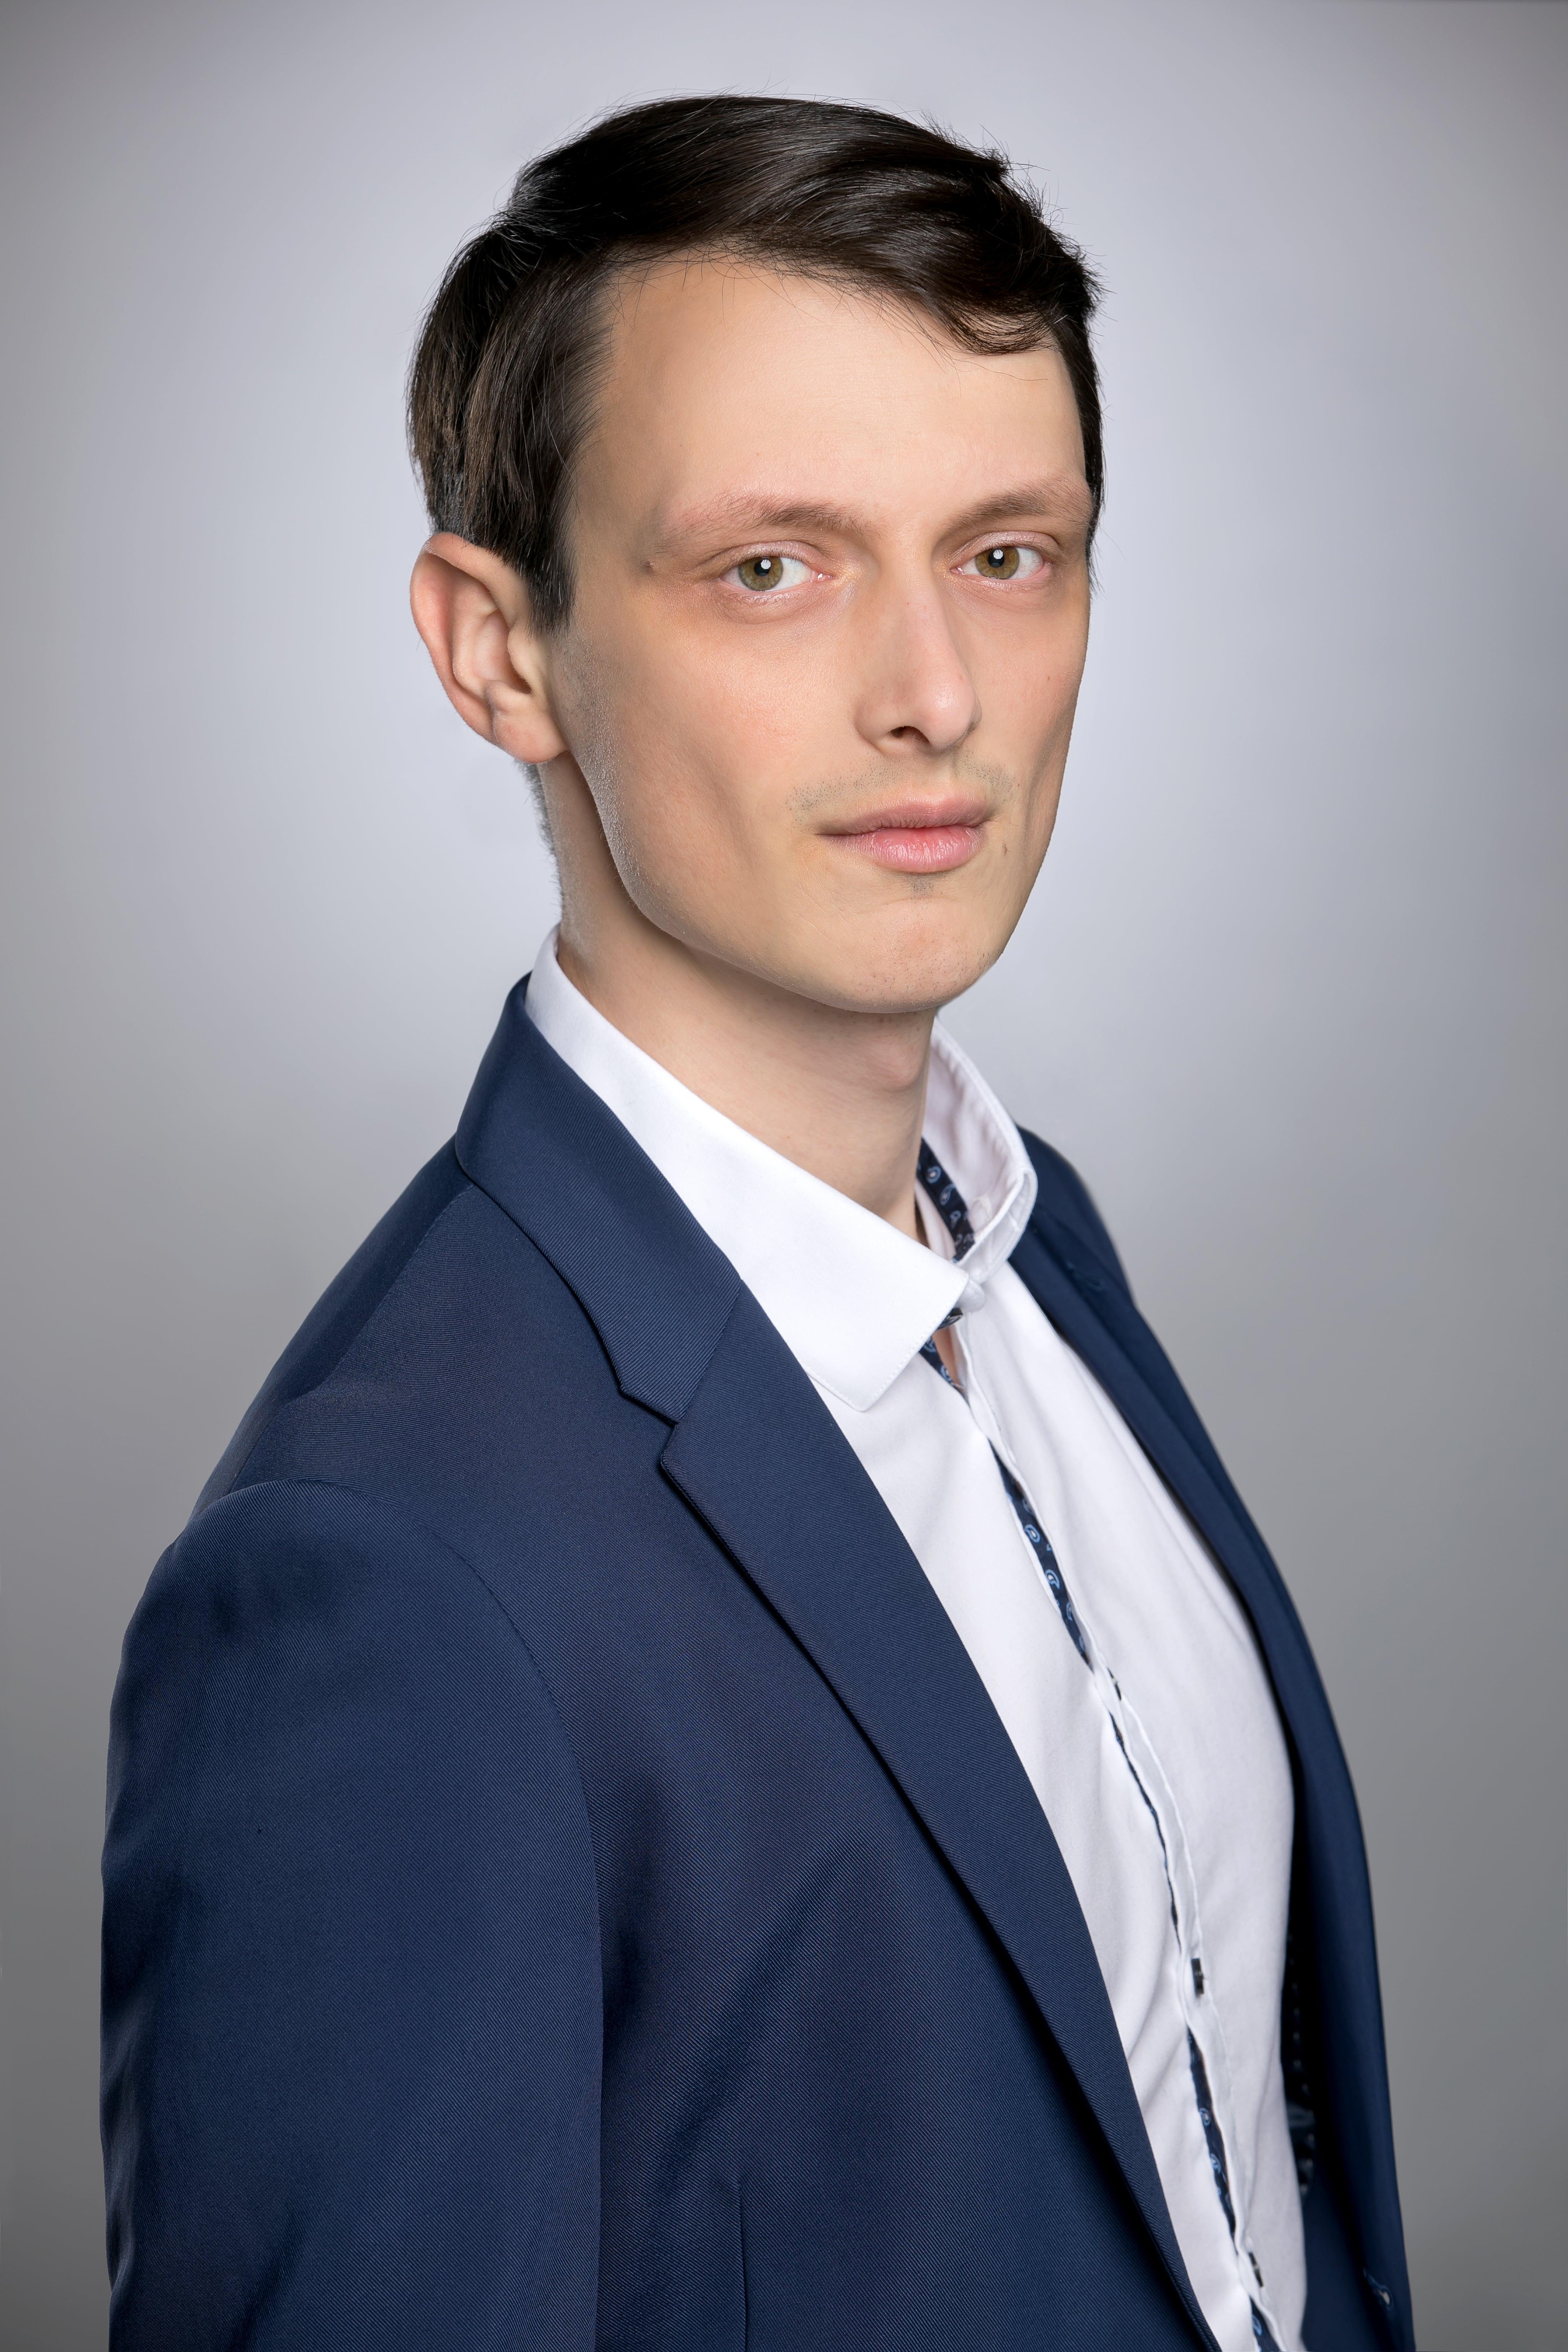 Vili Datsov